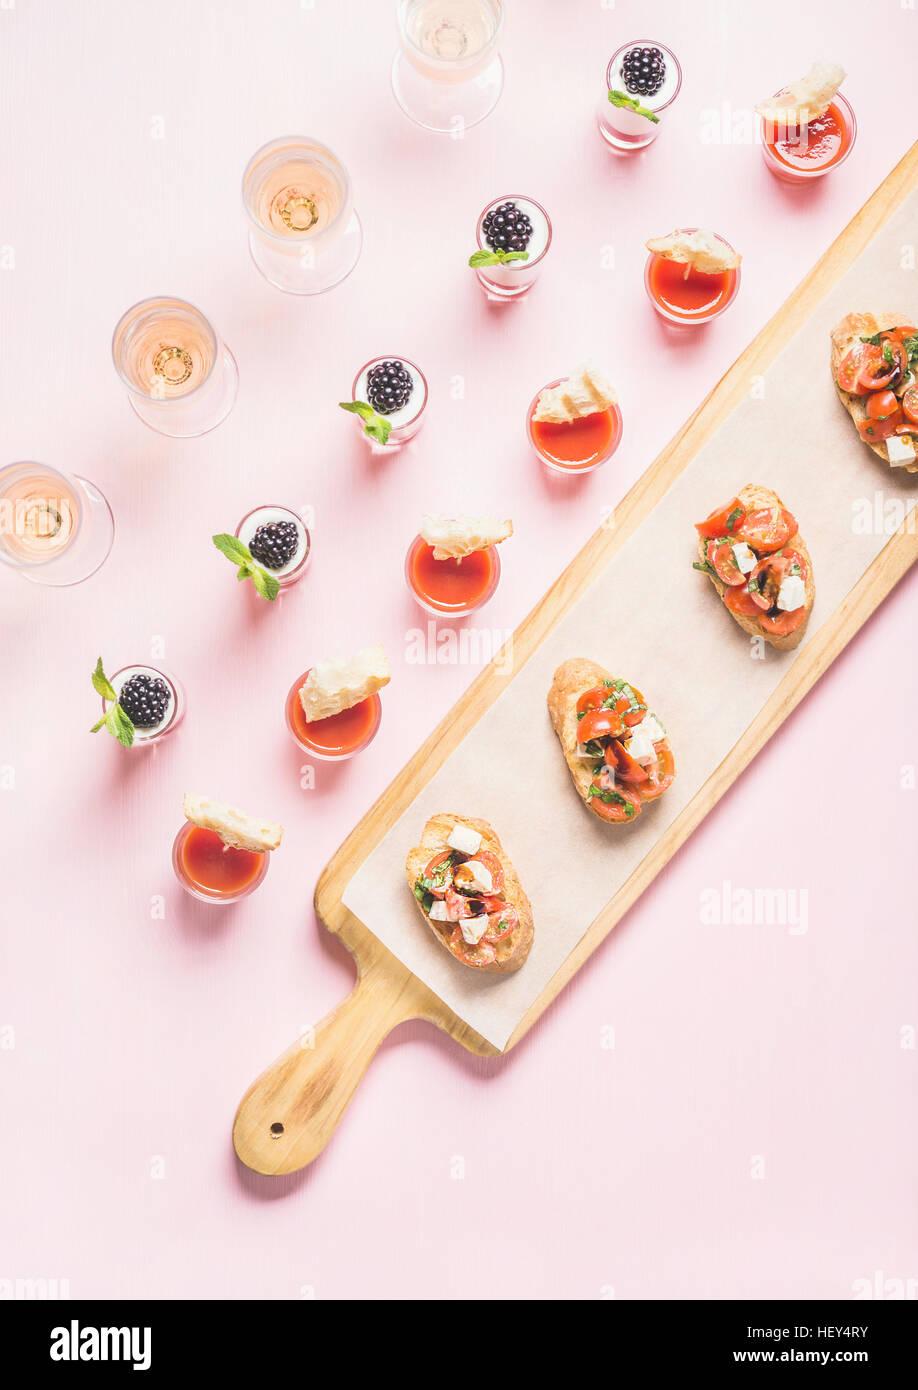 Snacks, brushetta sandwiches, gazpacho shots, desserts over pastel pink background - Stock Image